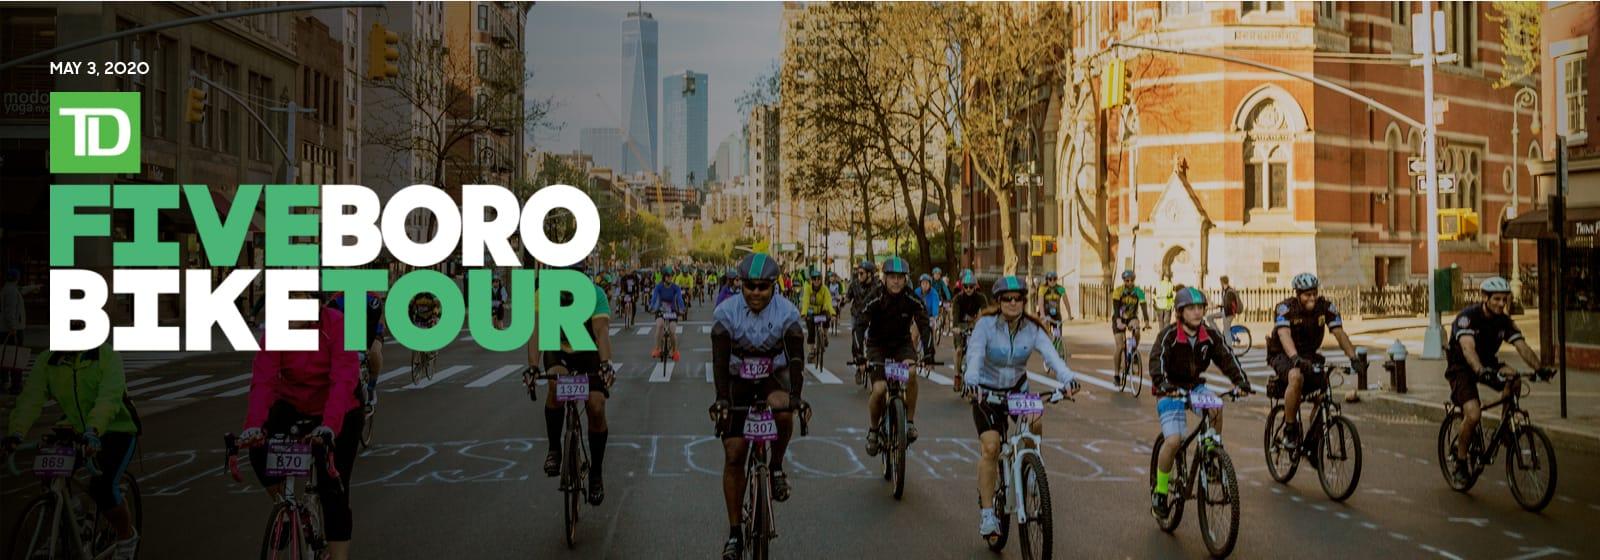 2020 Bike Tour Registration